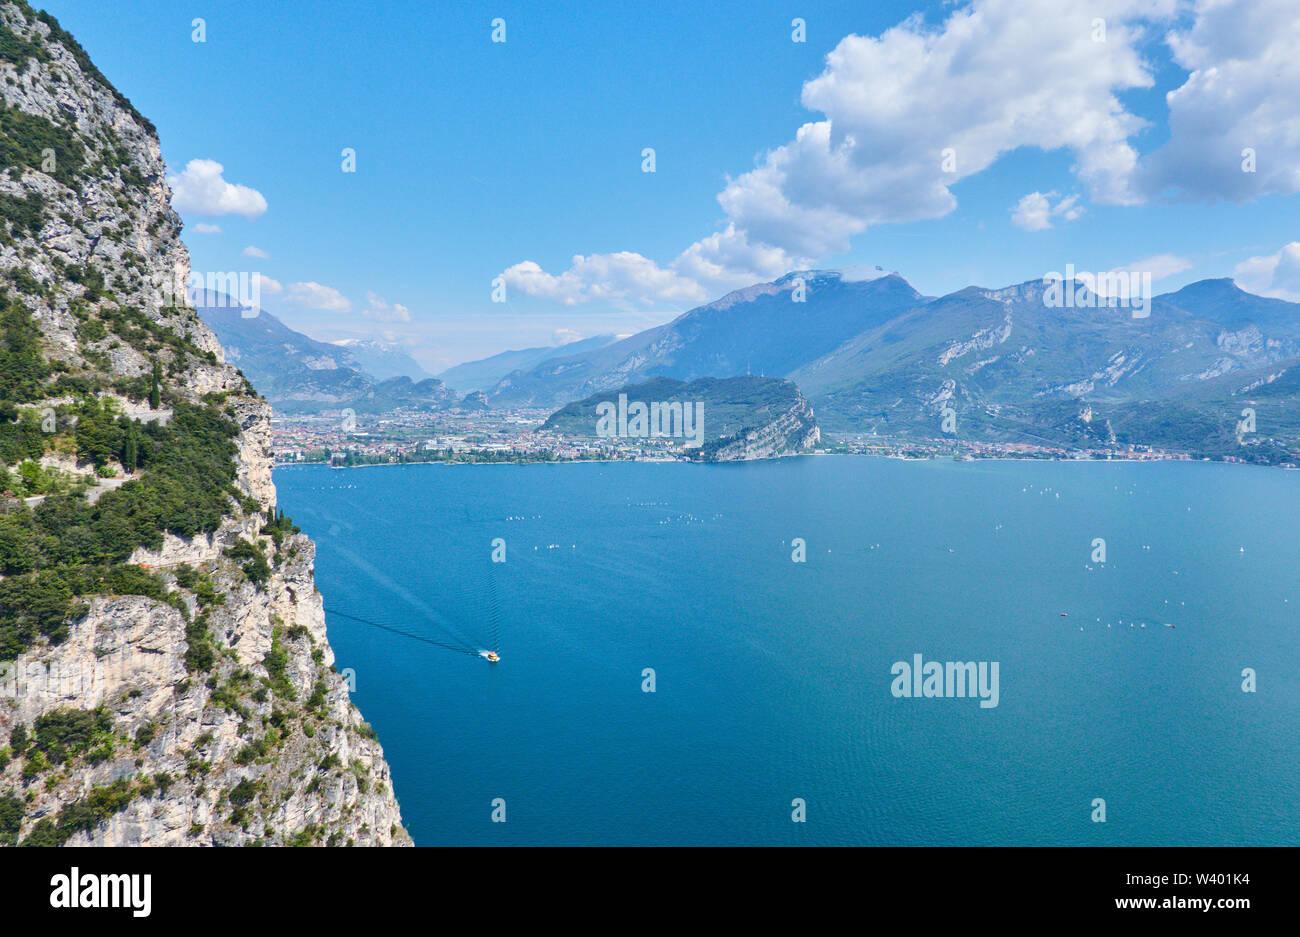 Bike road up to Pregasina  with Monte Brione mountain  at Lago di Garda, Lake Garda in Torbole - Nago, Riva, Trentino , Italy at April 17, 2019. © Pet - Stock Image